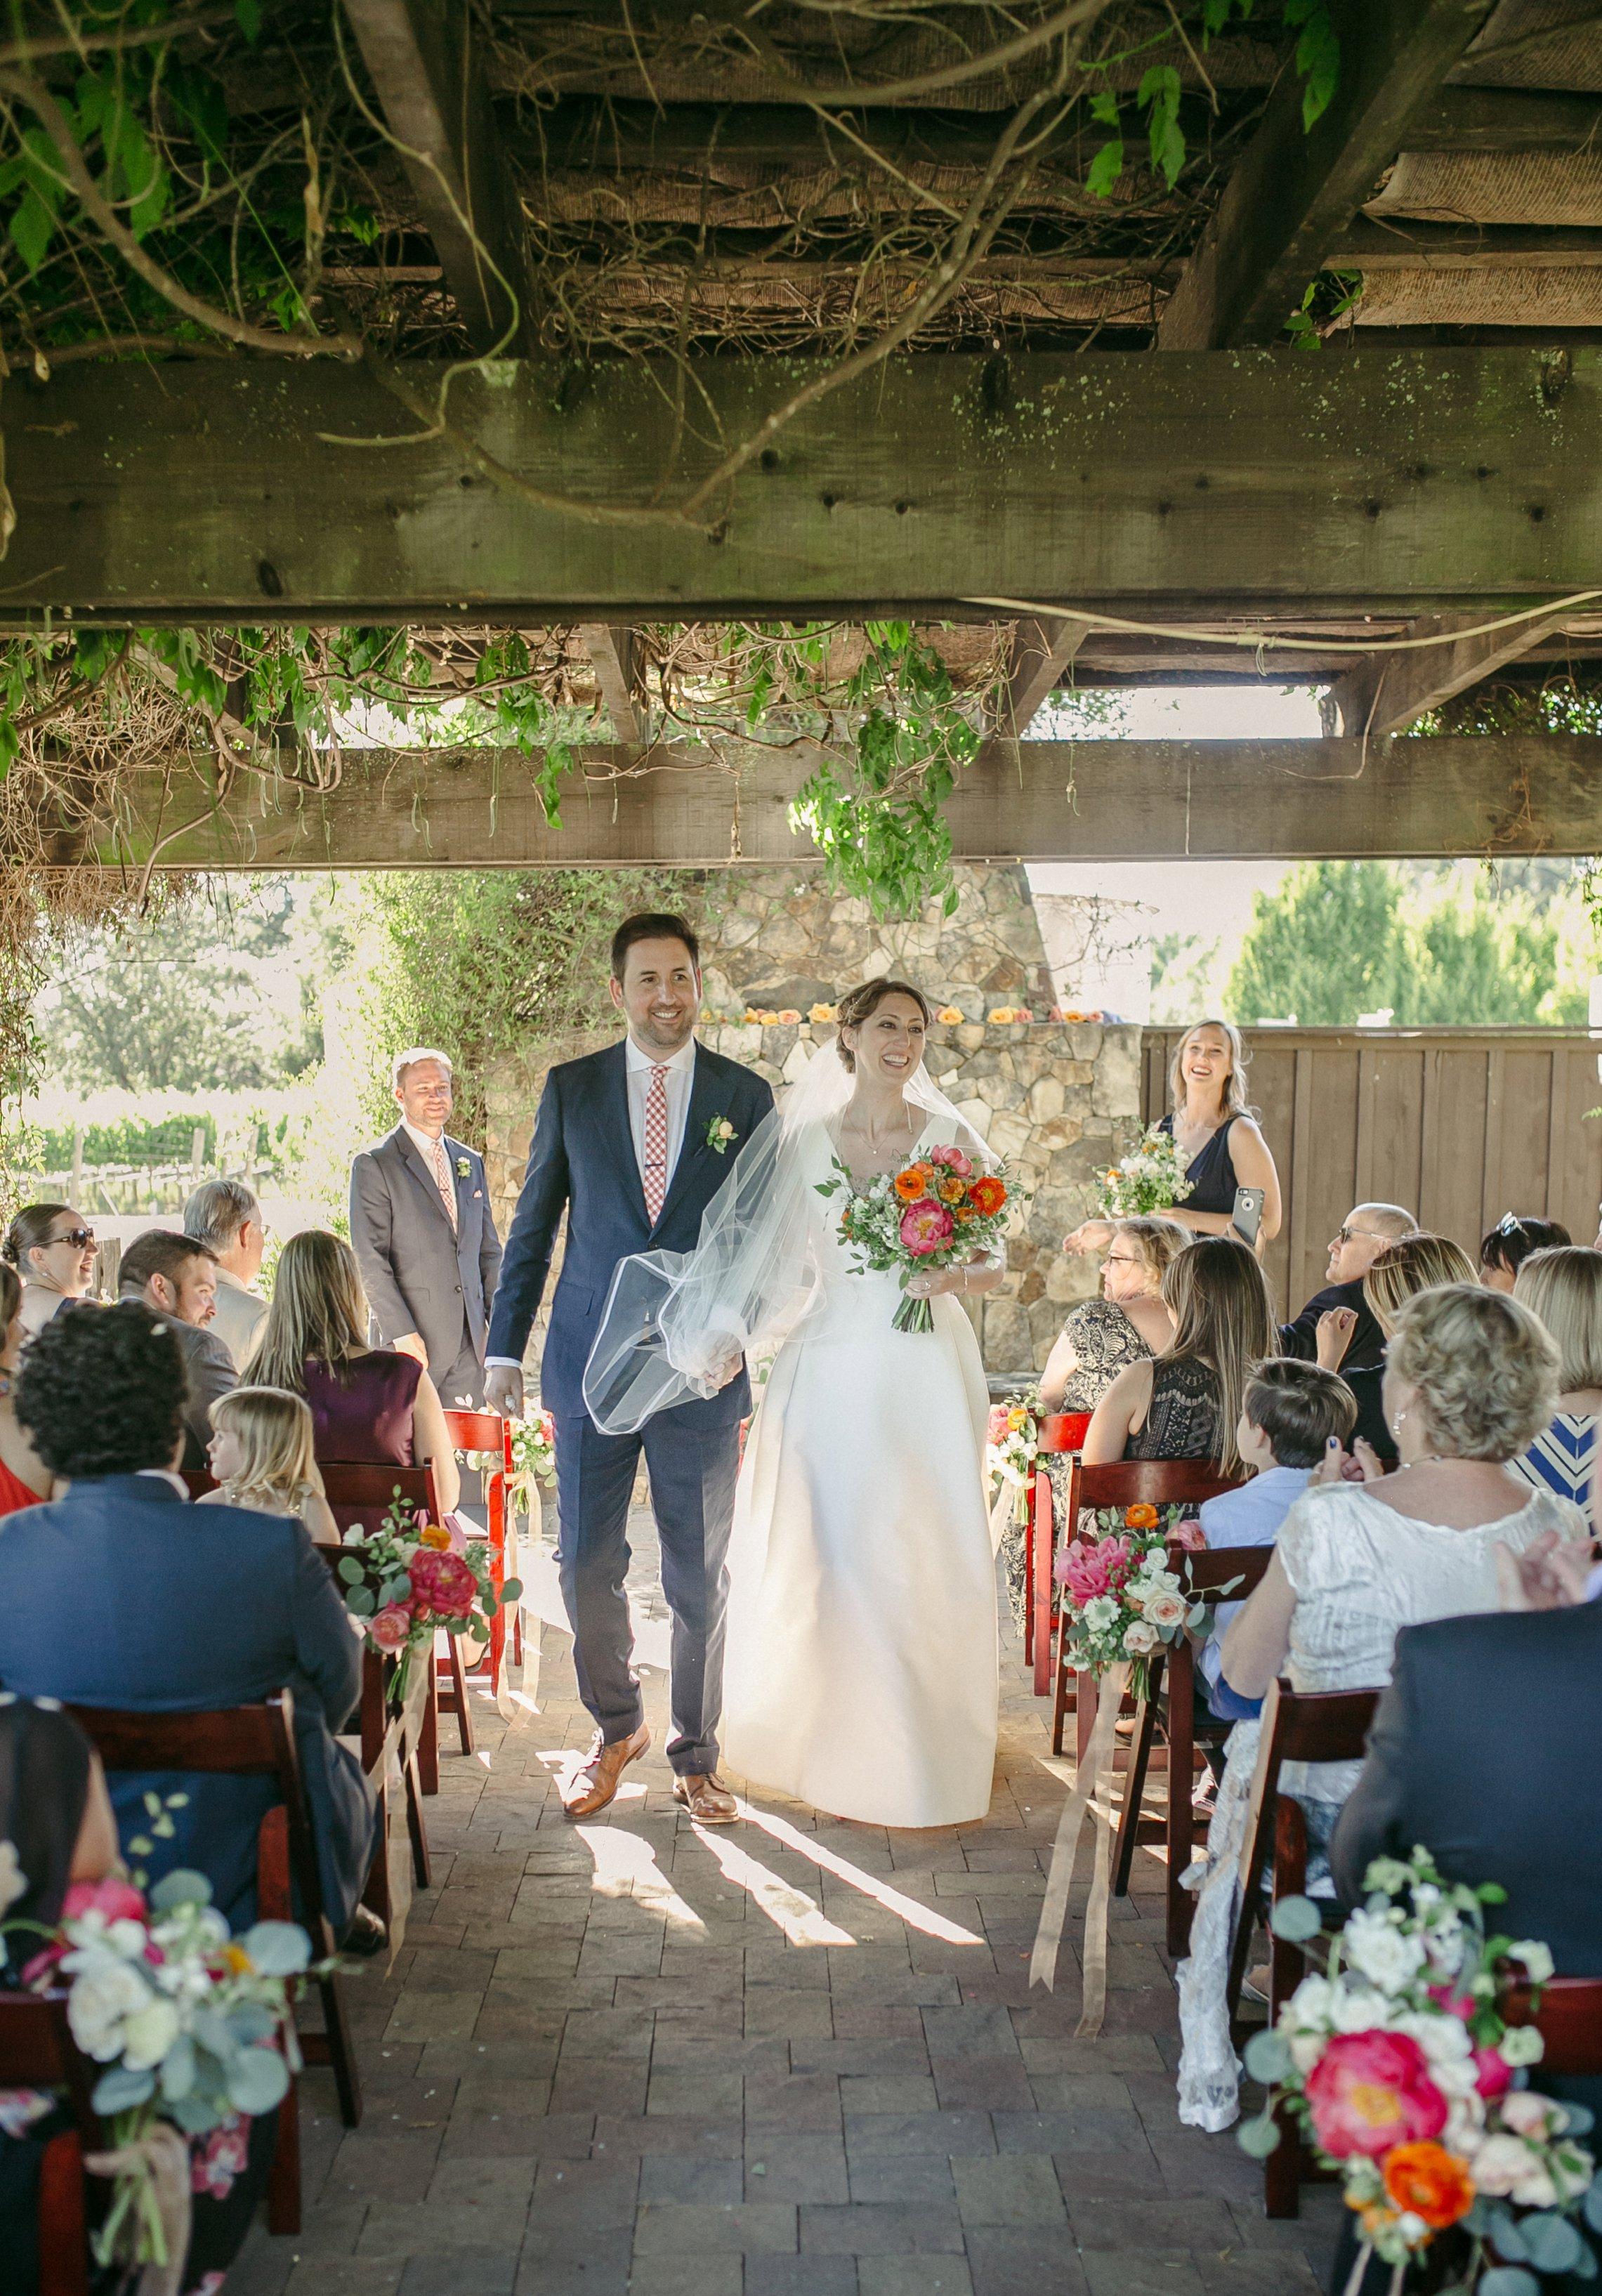 Healdsburg_Dutcher_Crossing_Winery_Wedding_0007.jpg